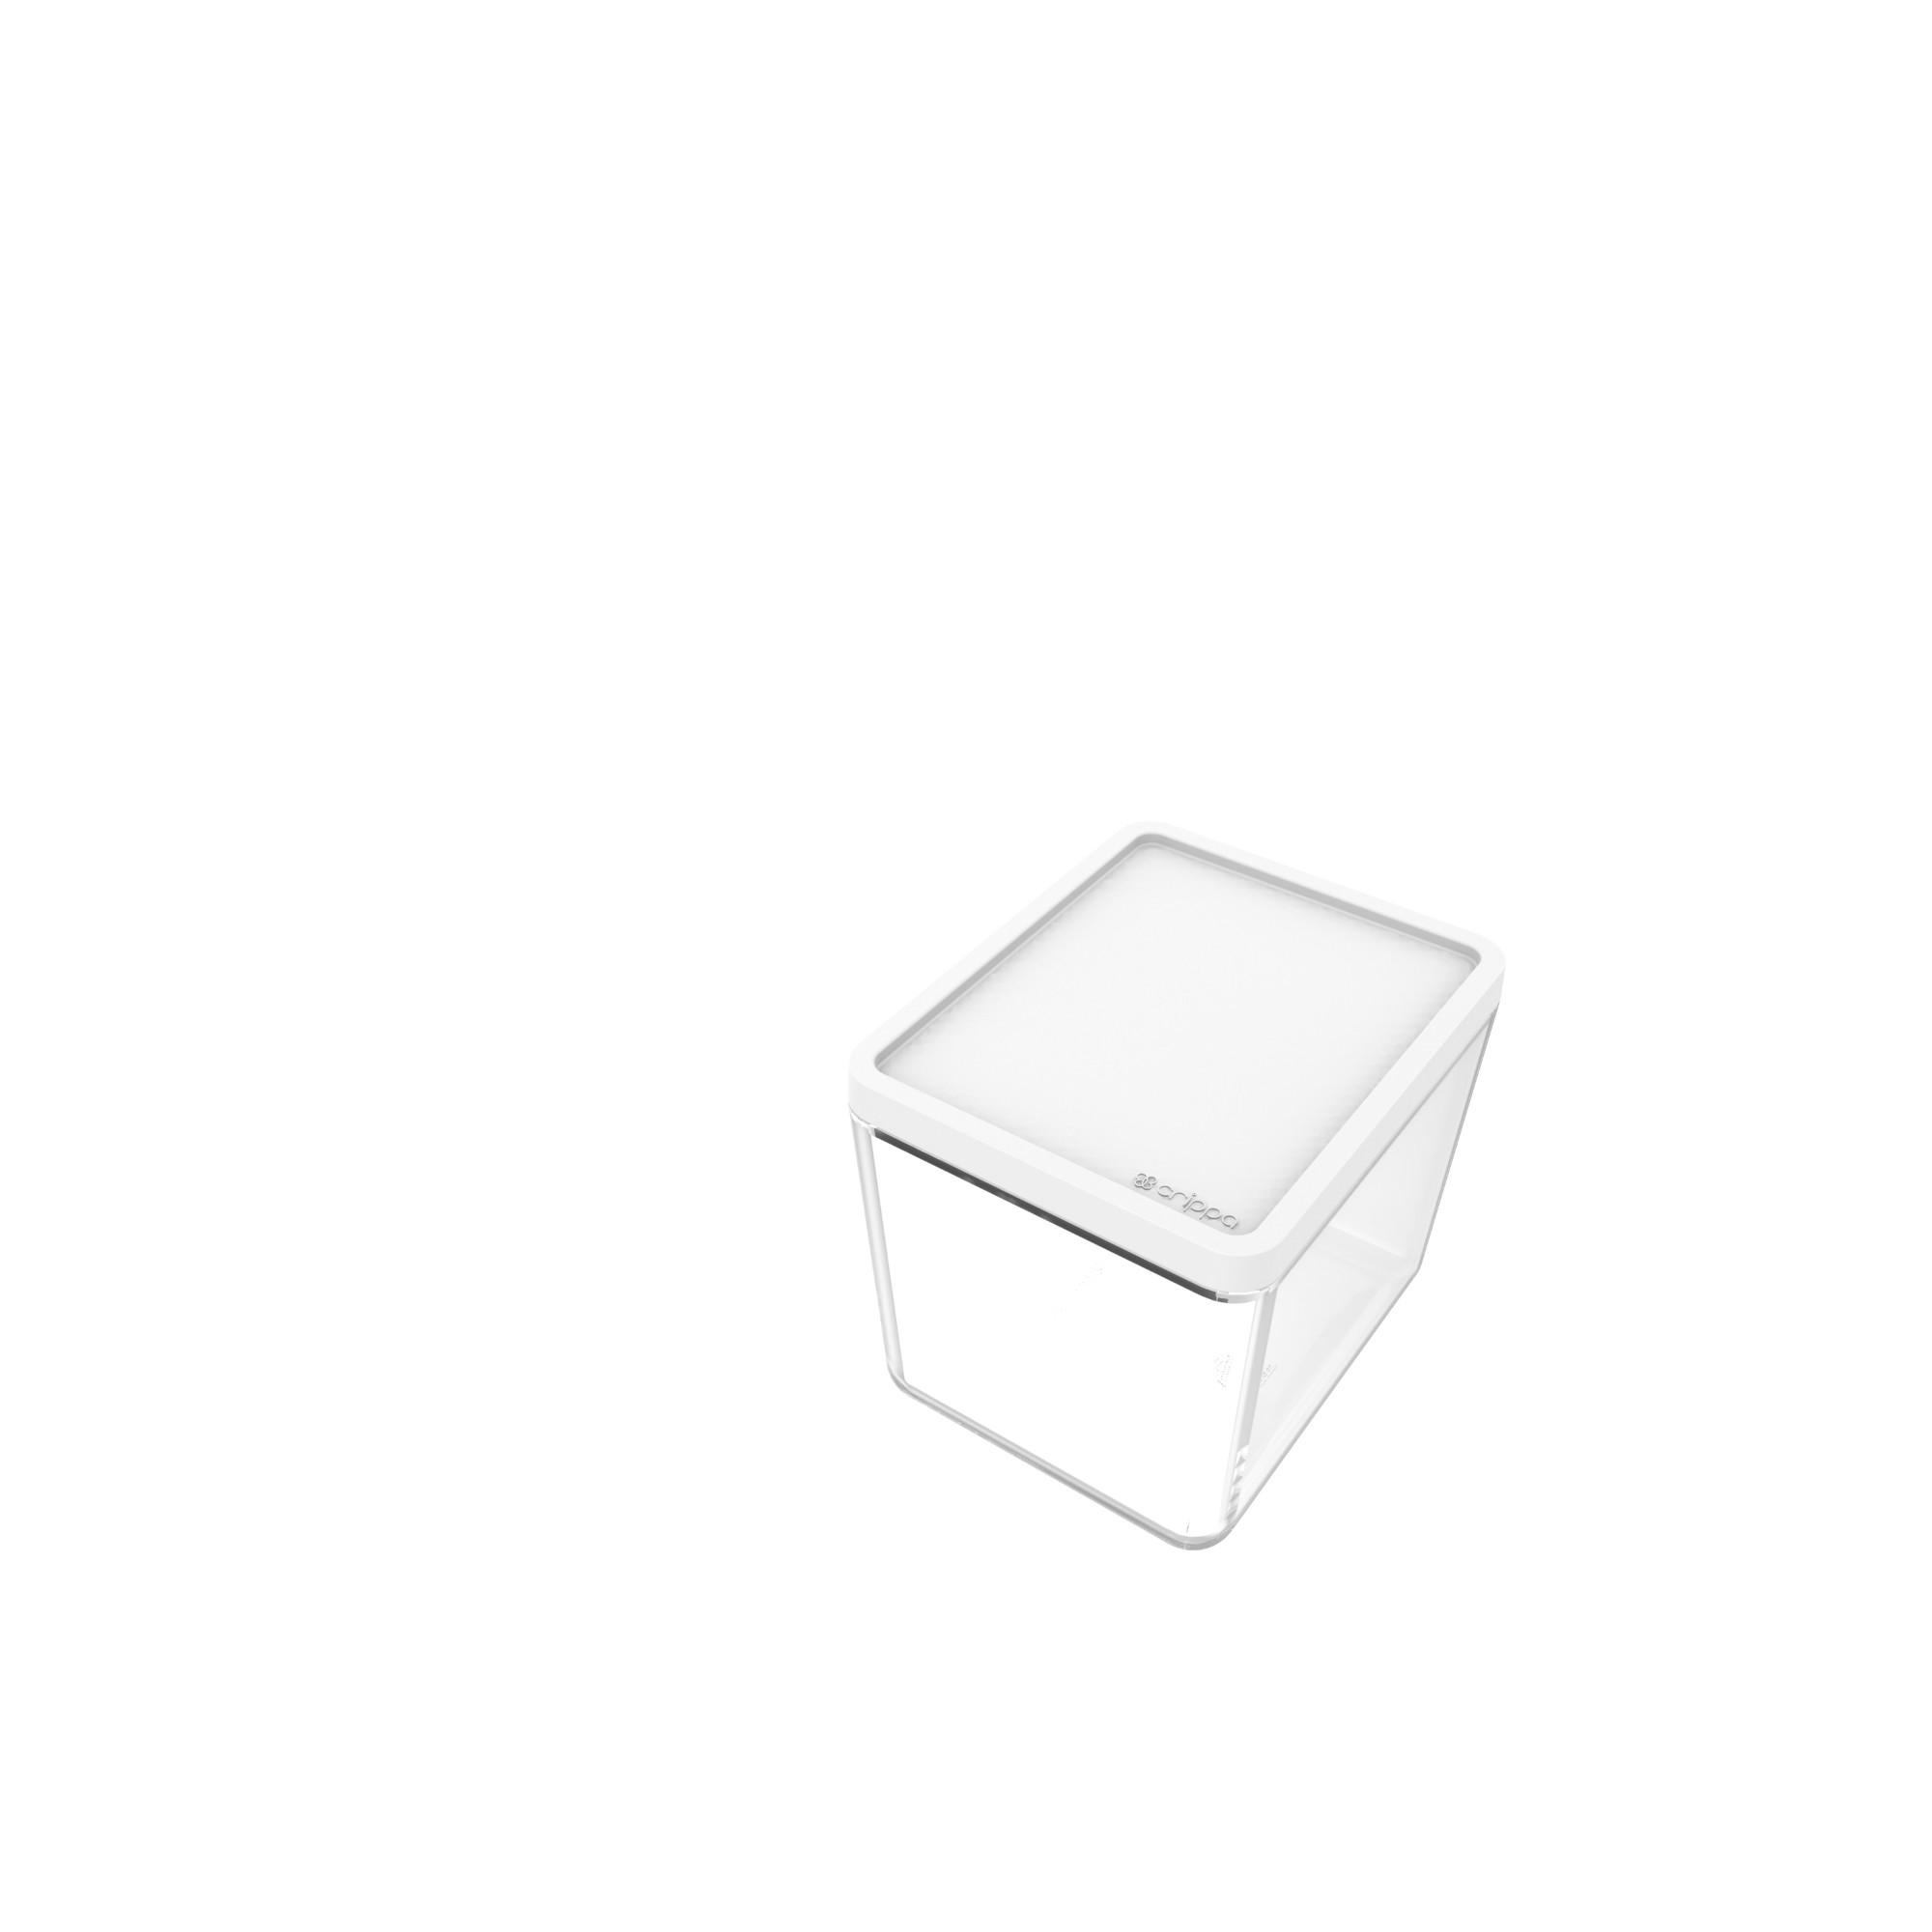 Pote Plastico Hermetico Retangular 350ml Branco - Crippa